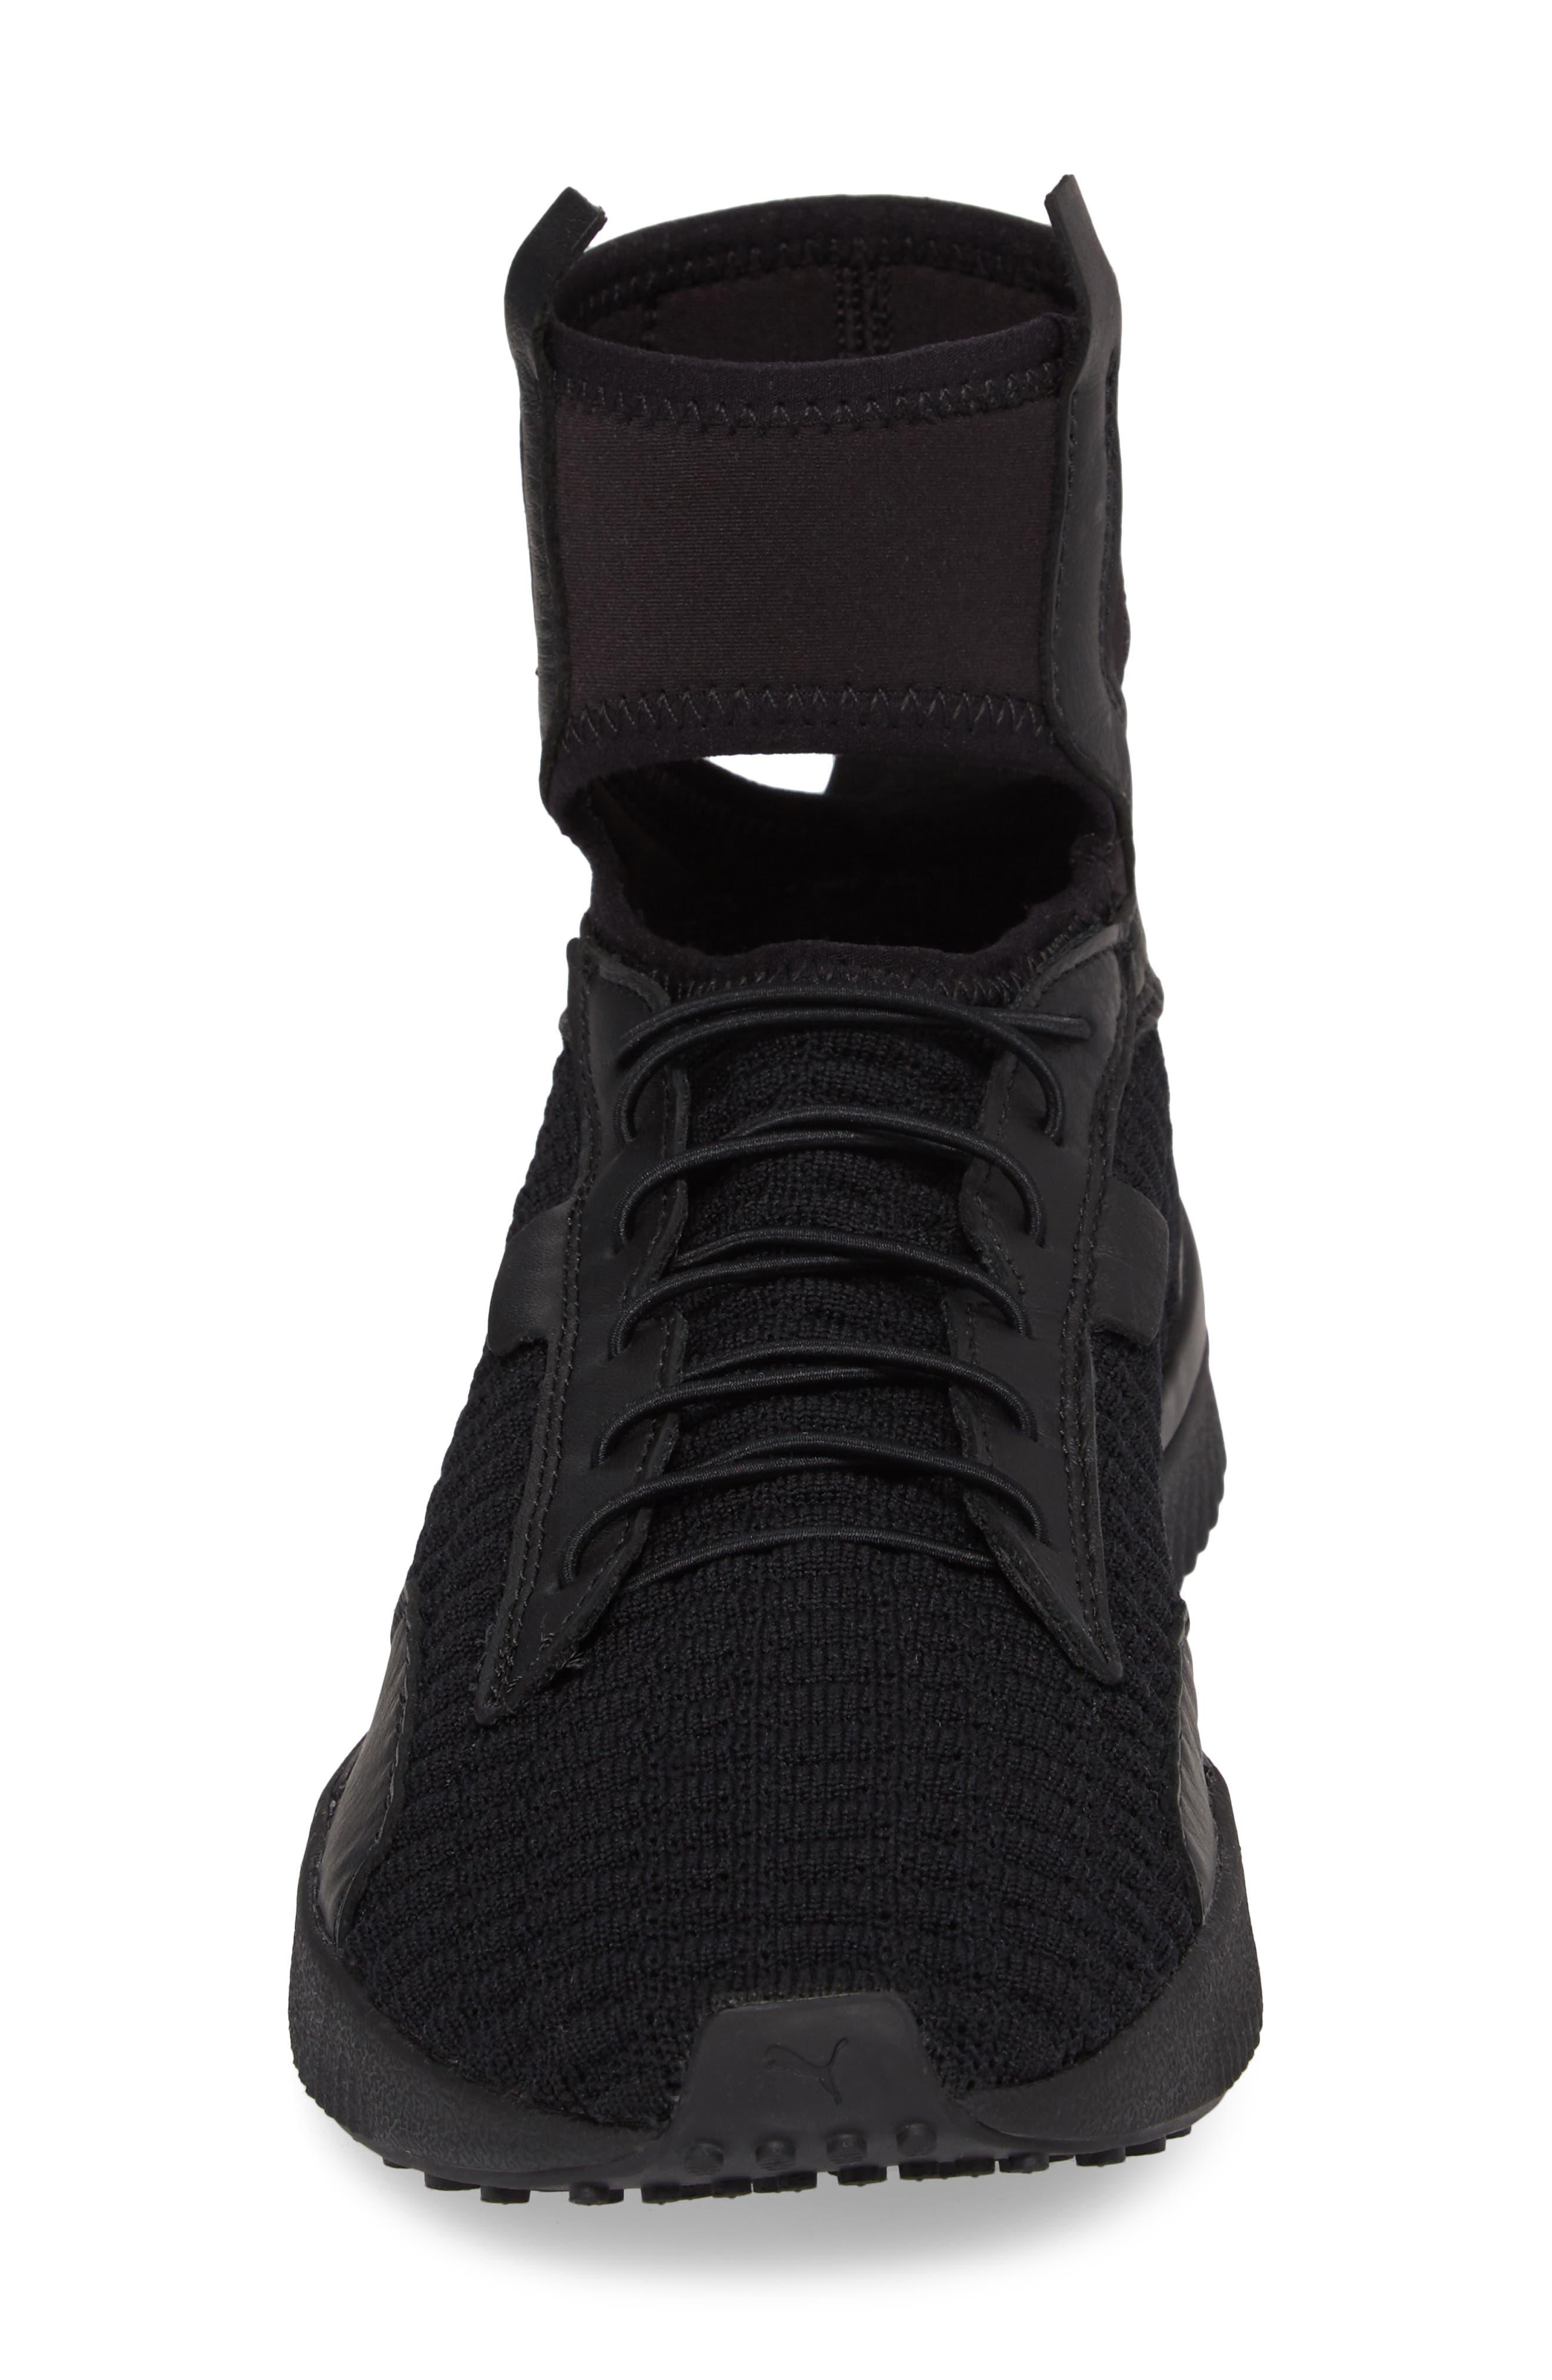 FENTY PUMA by Rihanna High Top Sneaker,                             Alternate thumbnail 4, color,                             001